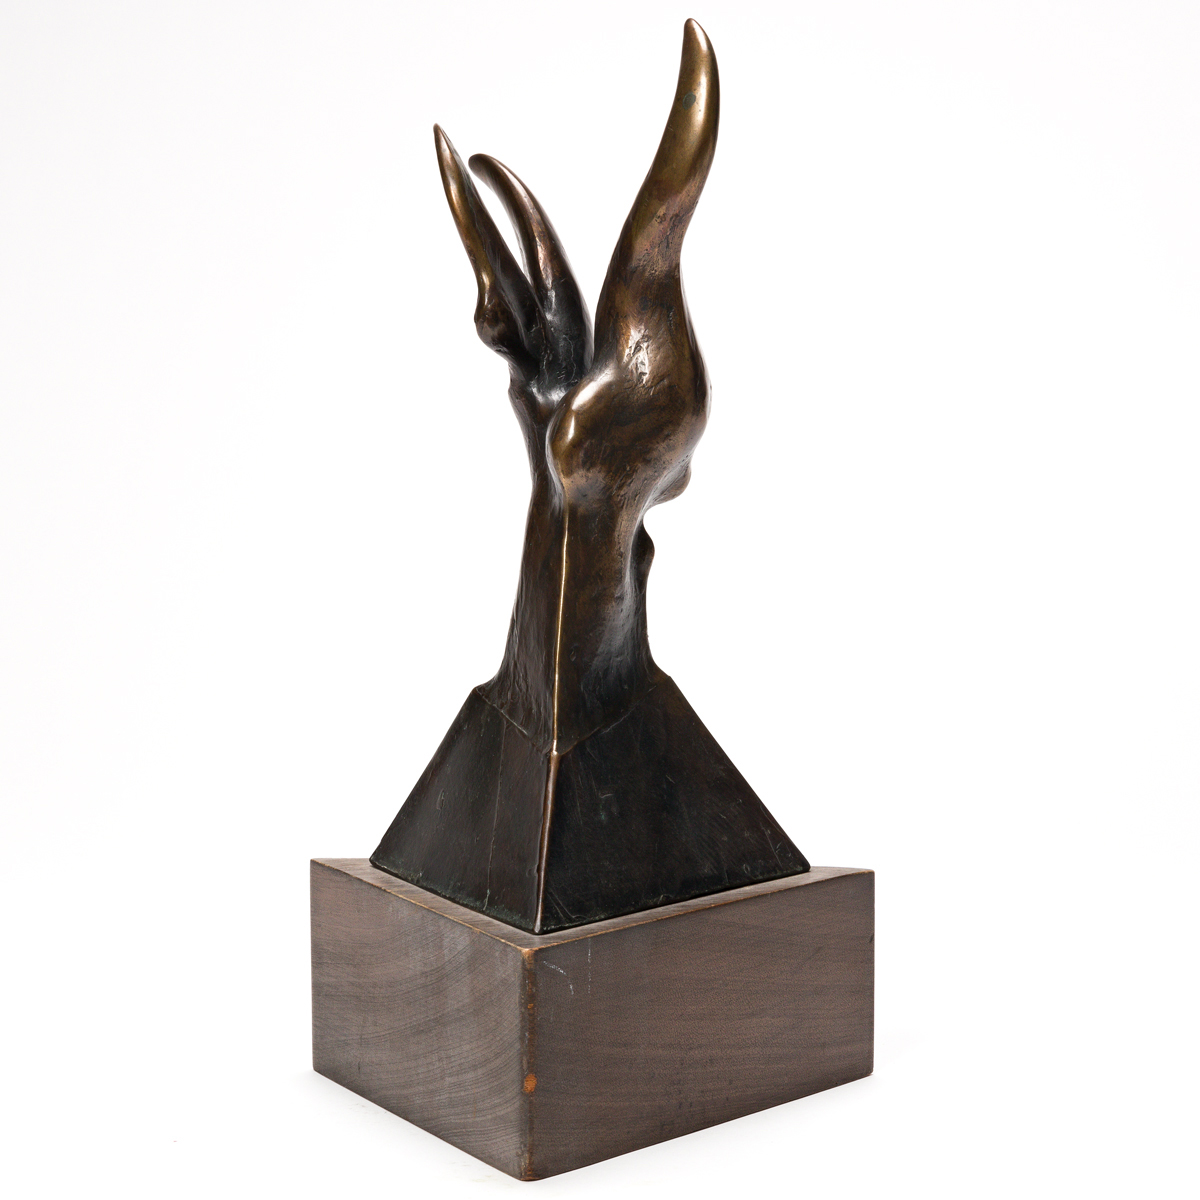 RICHARD HUNT (1935 - ) Untitled (Hybrid Form).